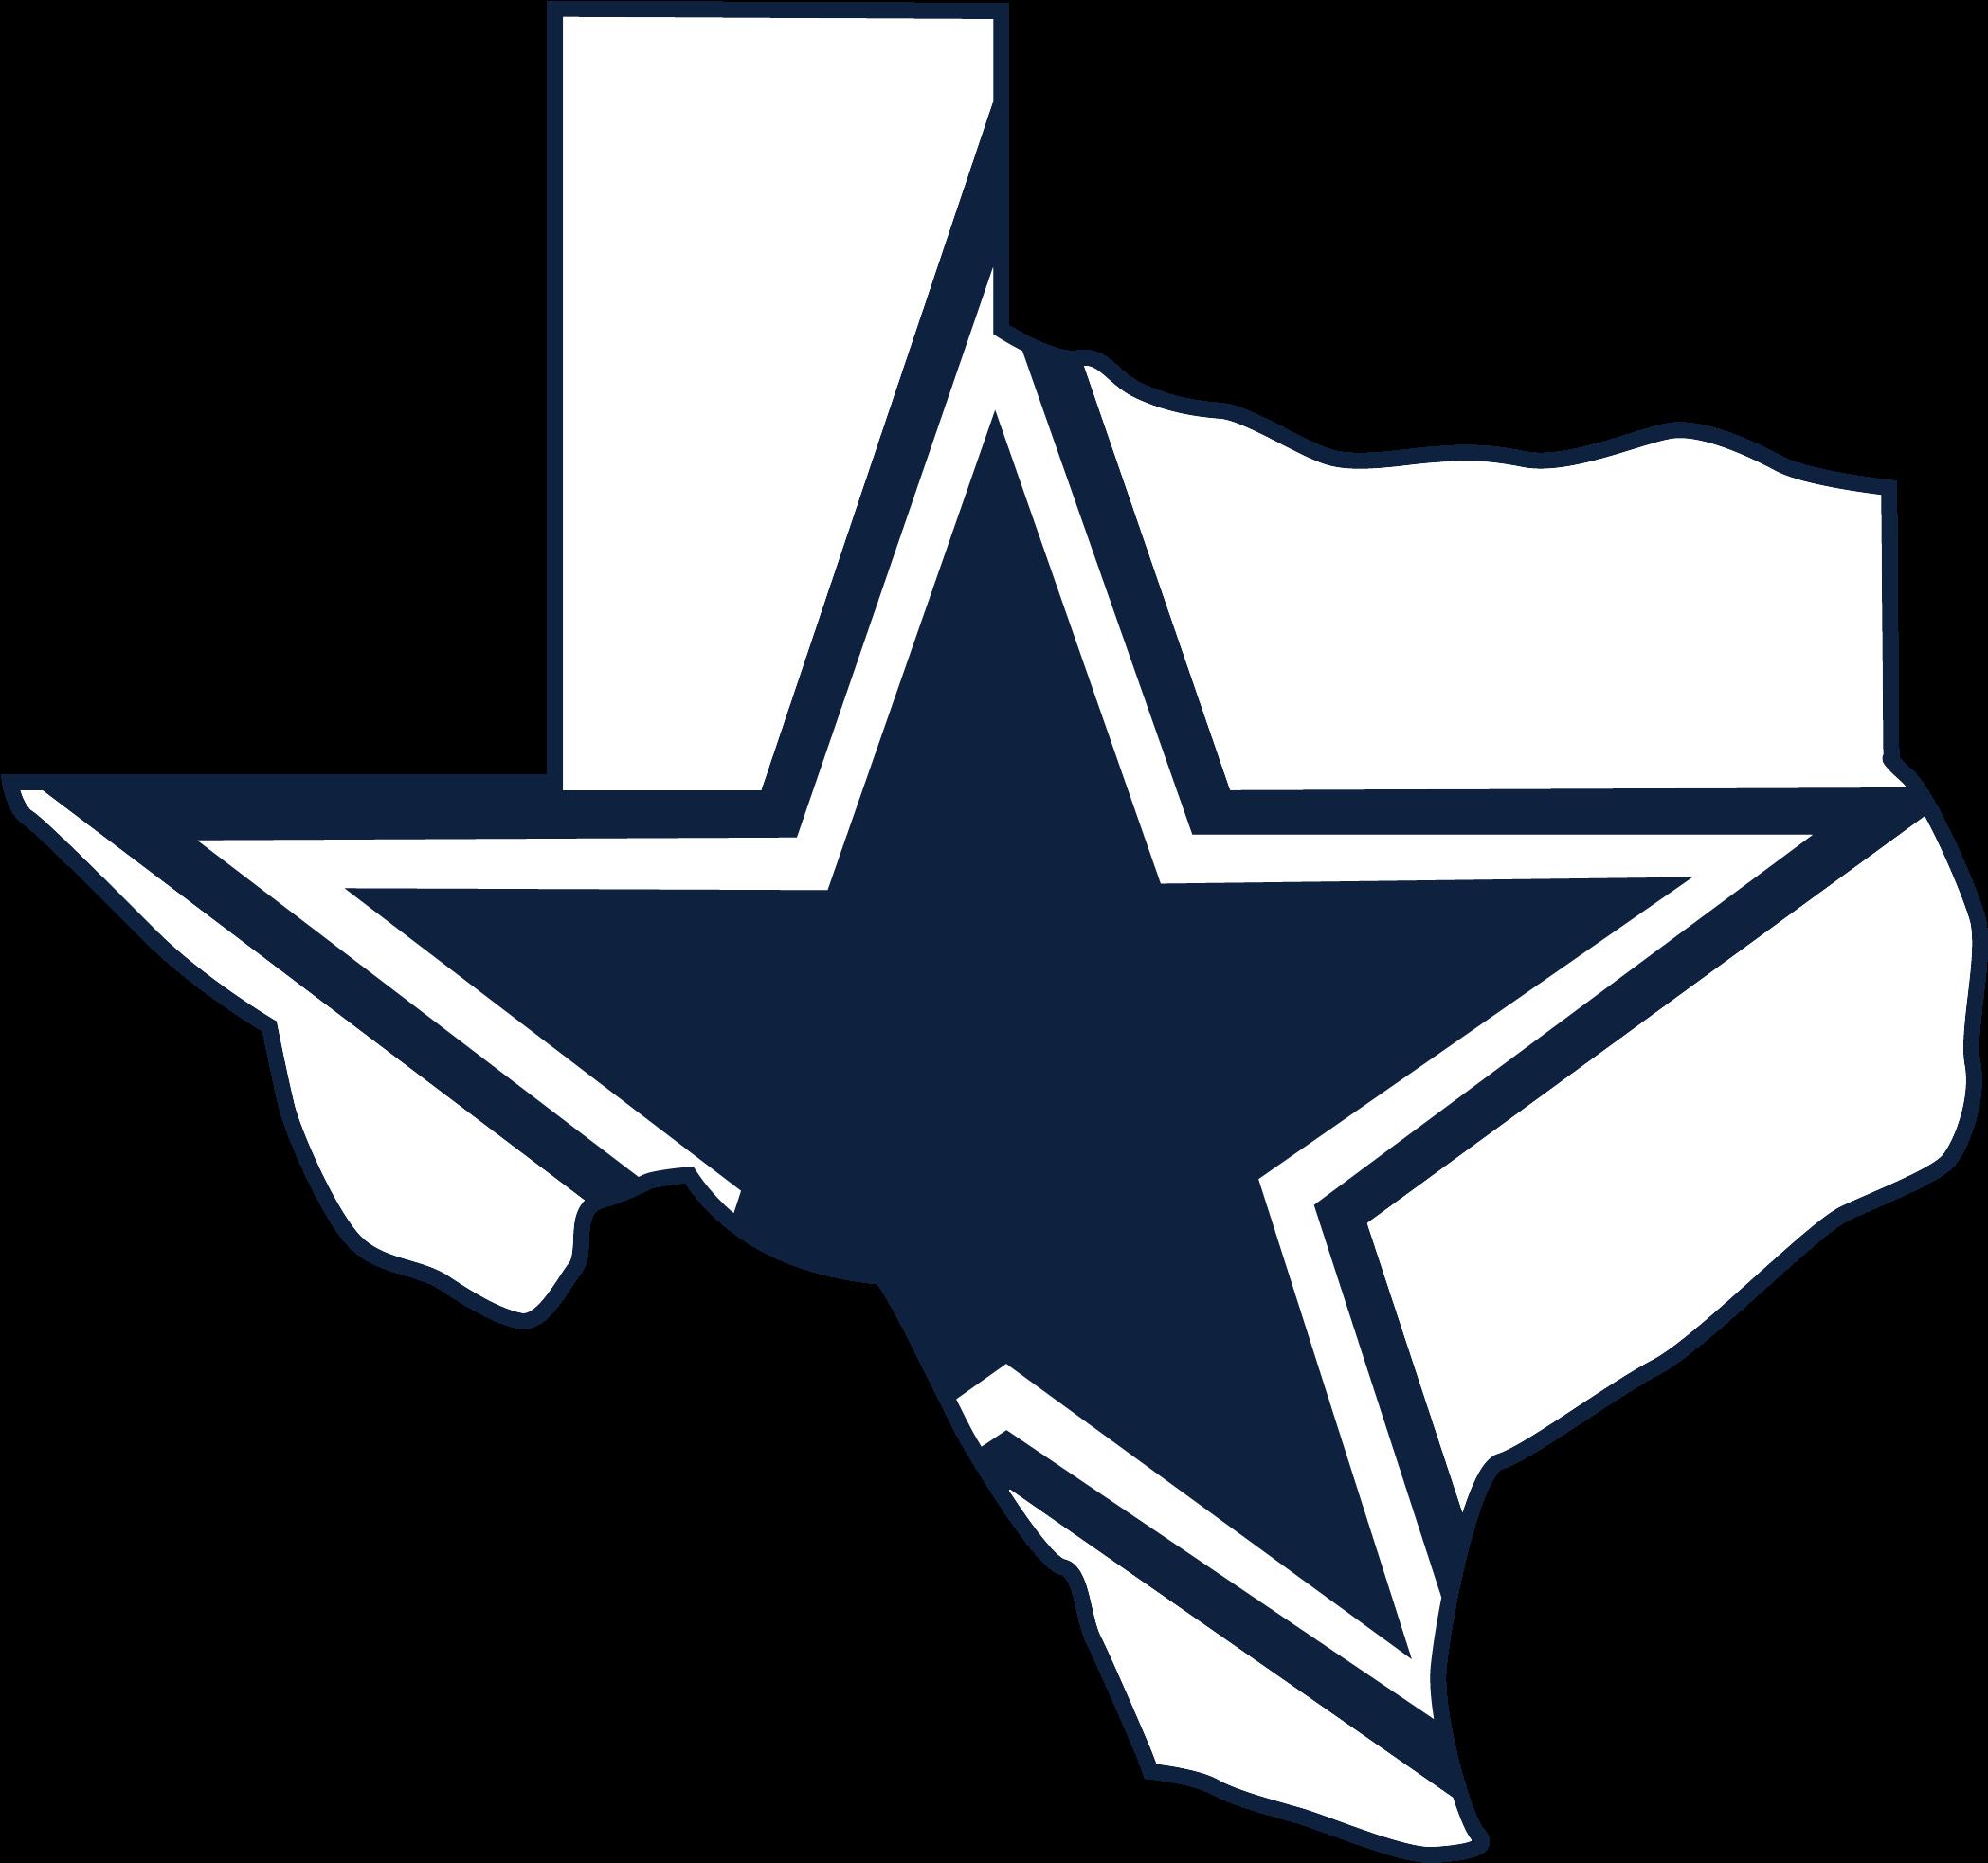 Dallas cowboys clipart outline. Yeti black